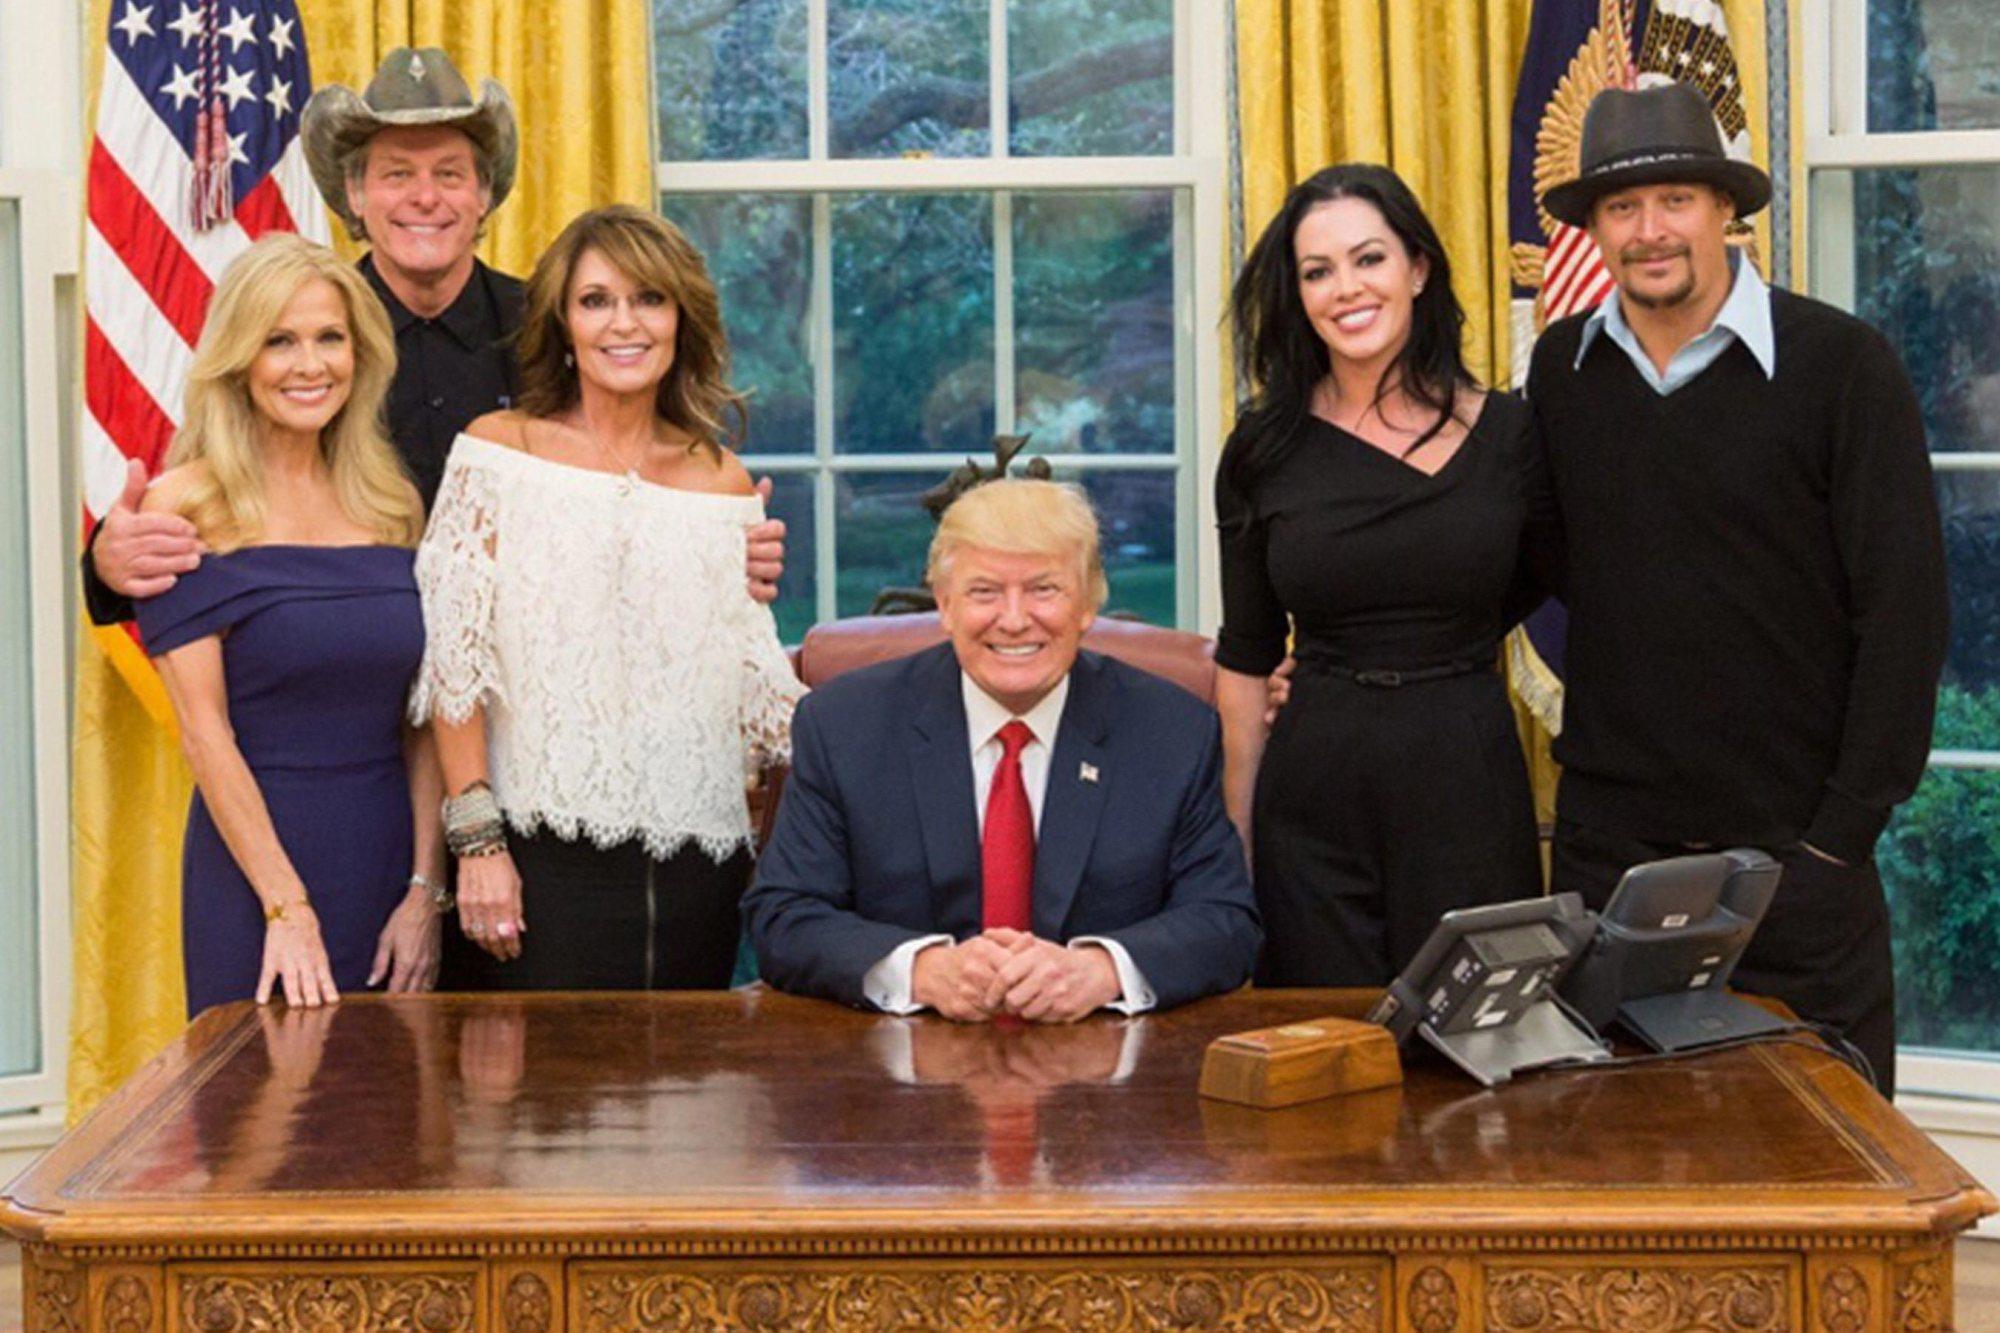 20_April_2017_Trump_Dinner_FFA.jpg